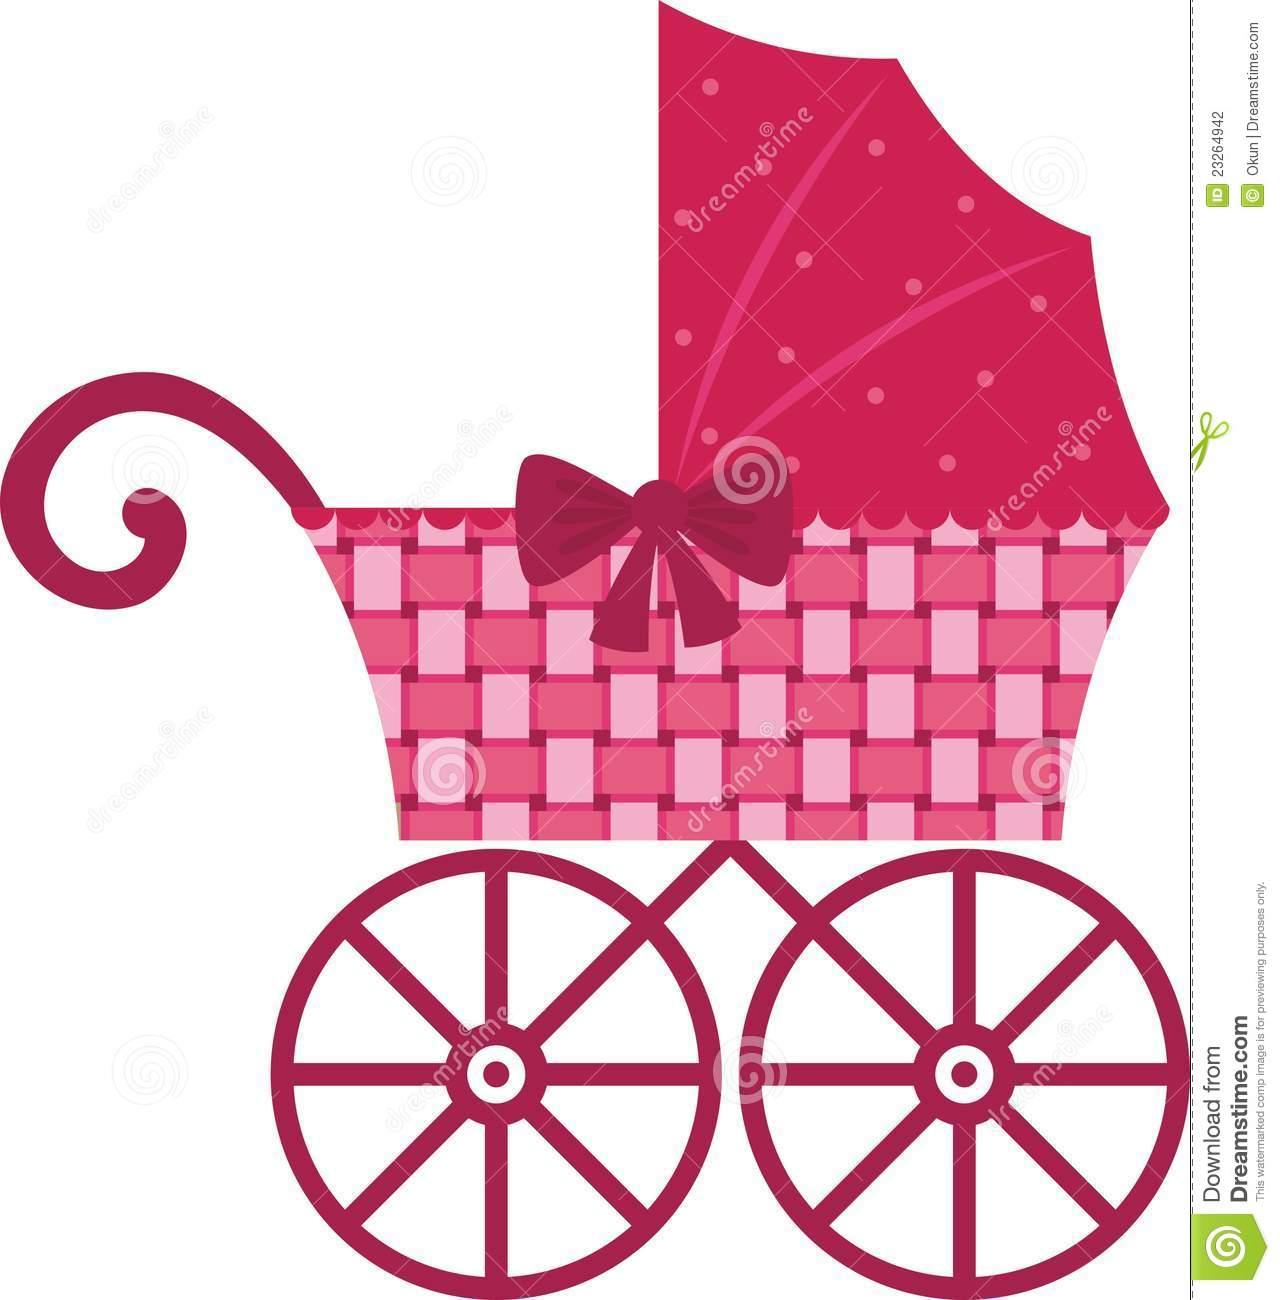 Baby girl stroler clipart vector freeuse library Baby stroller clipart - ClipartFest vector freeuse library